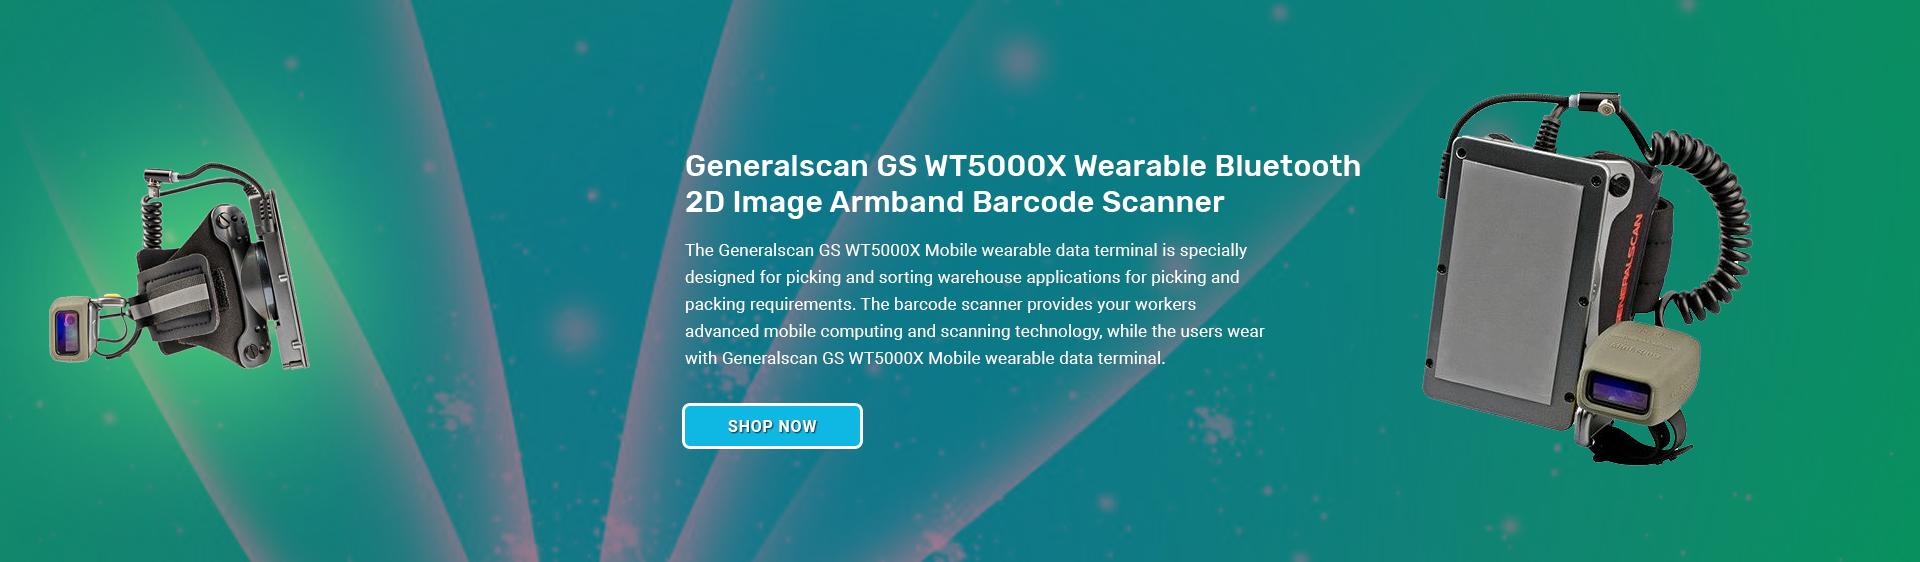 Generalscan GS WT5000X ...